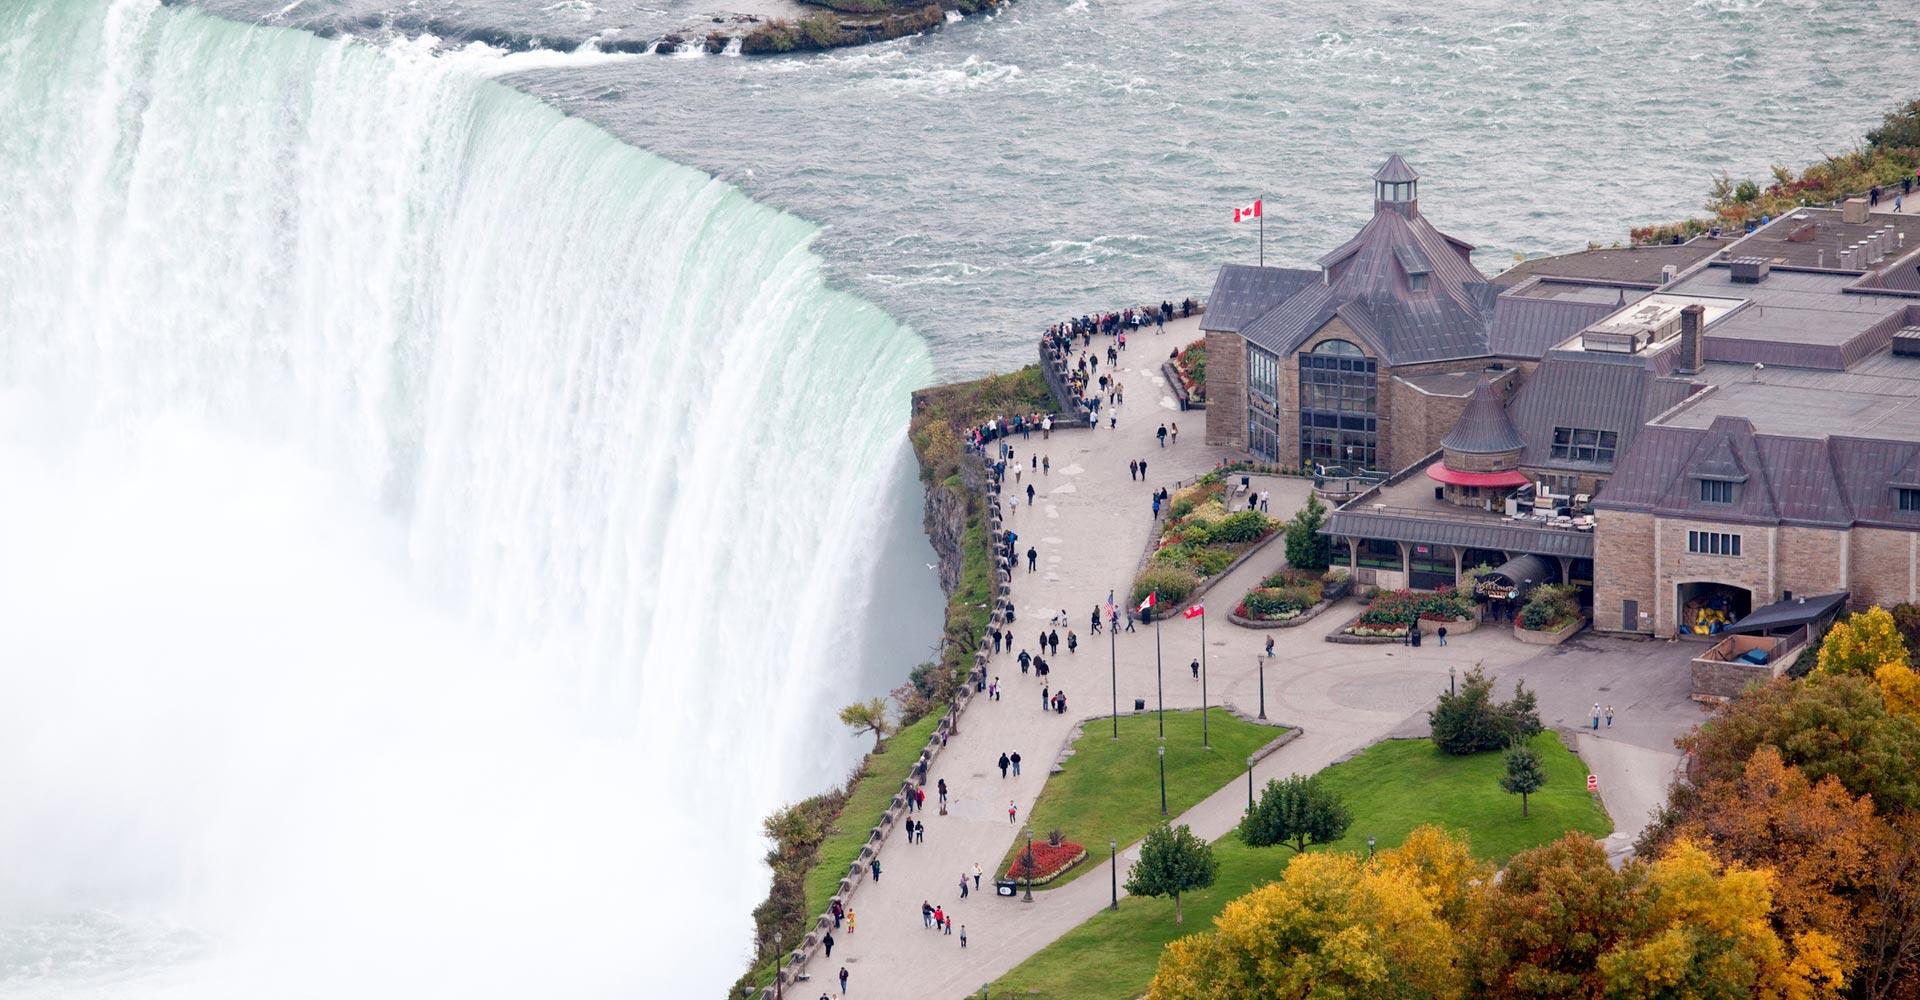 A Day Trip to Niagara Falls